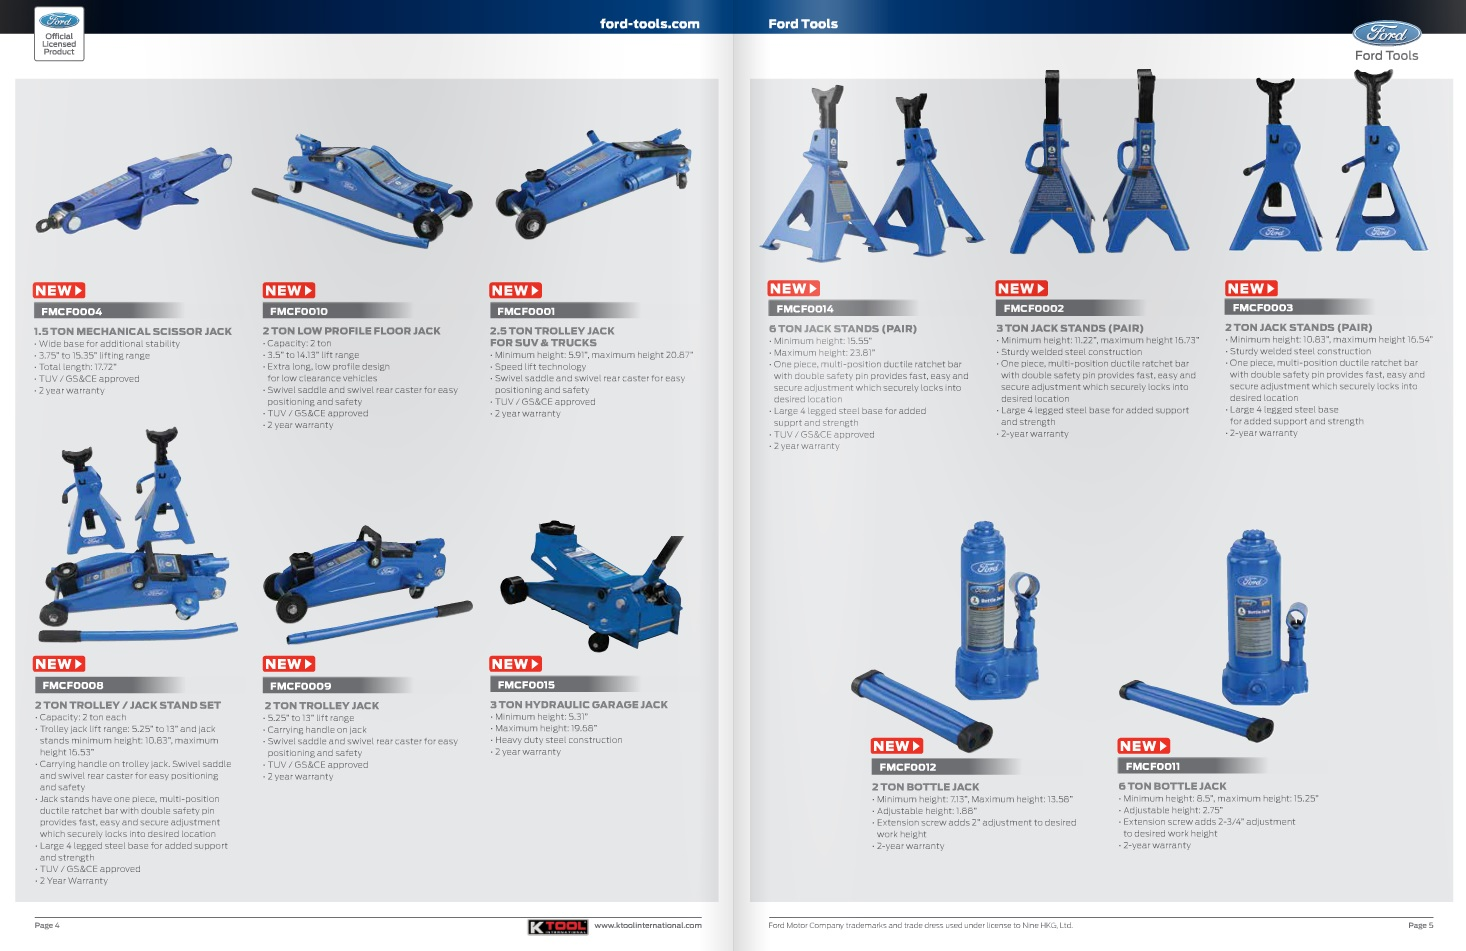 New Ford 12v Amp 20v Cordless Power Tools Hand Tools